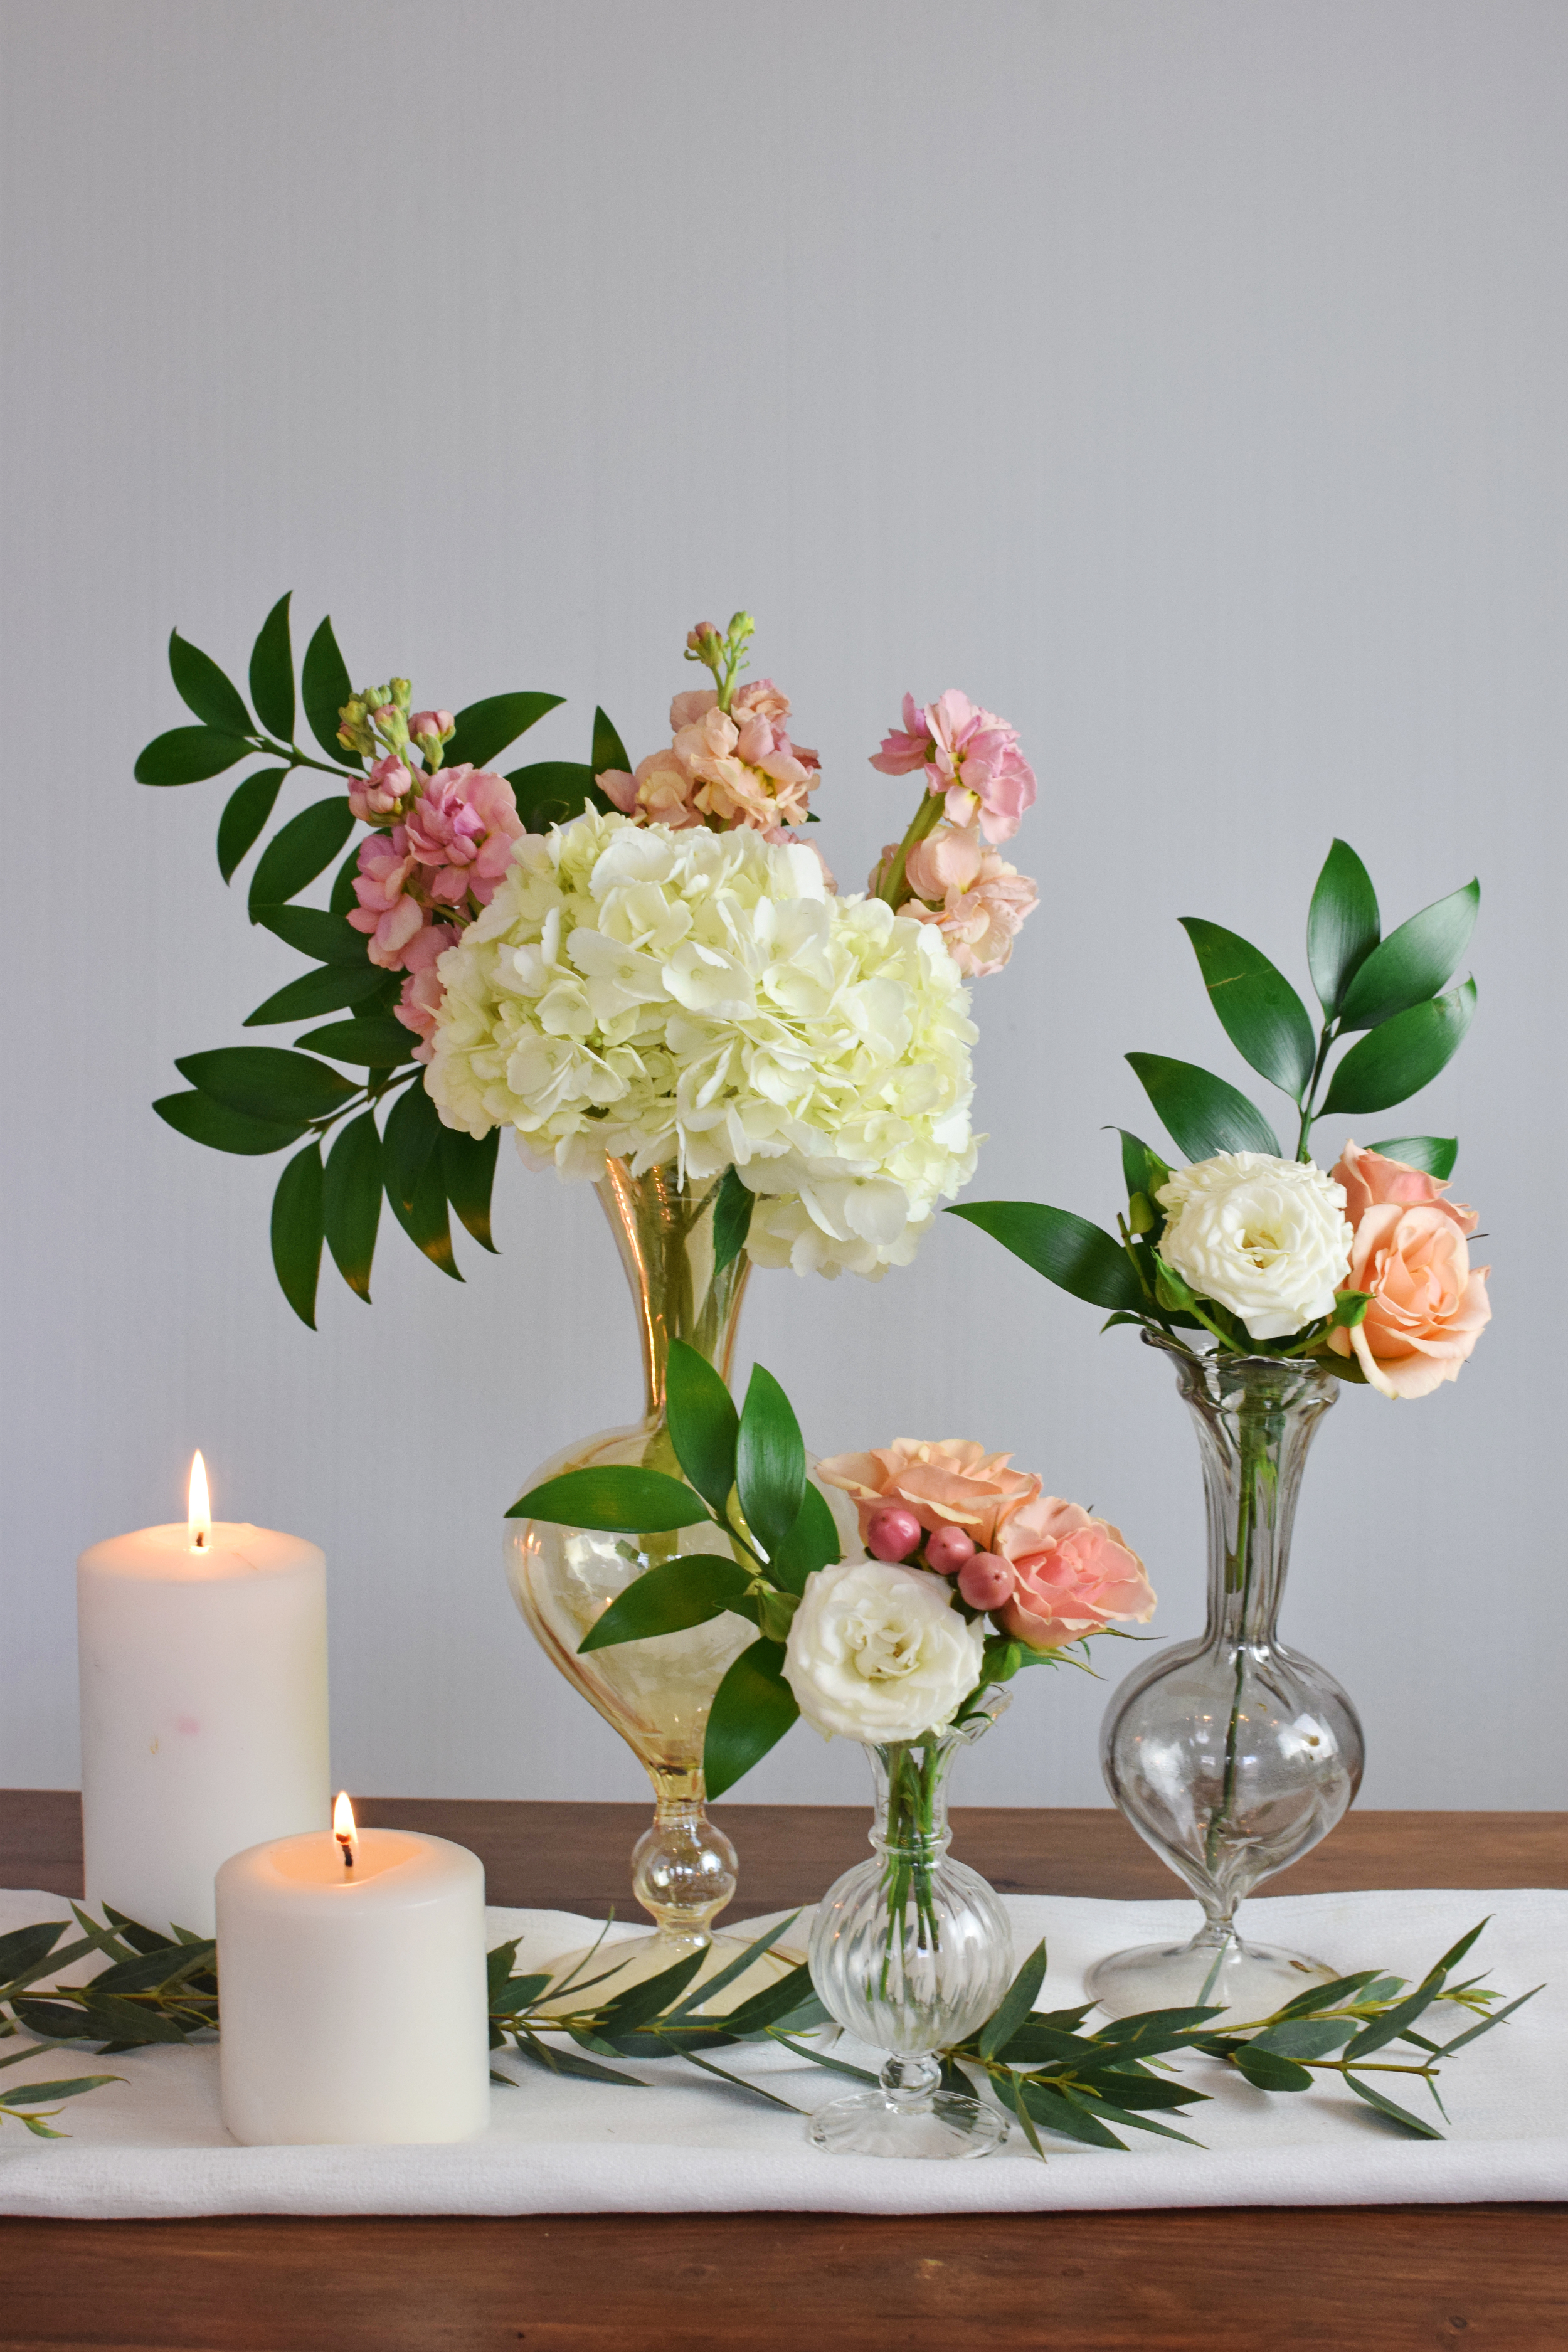 FlowerMoxiediybide_peach15.jpg